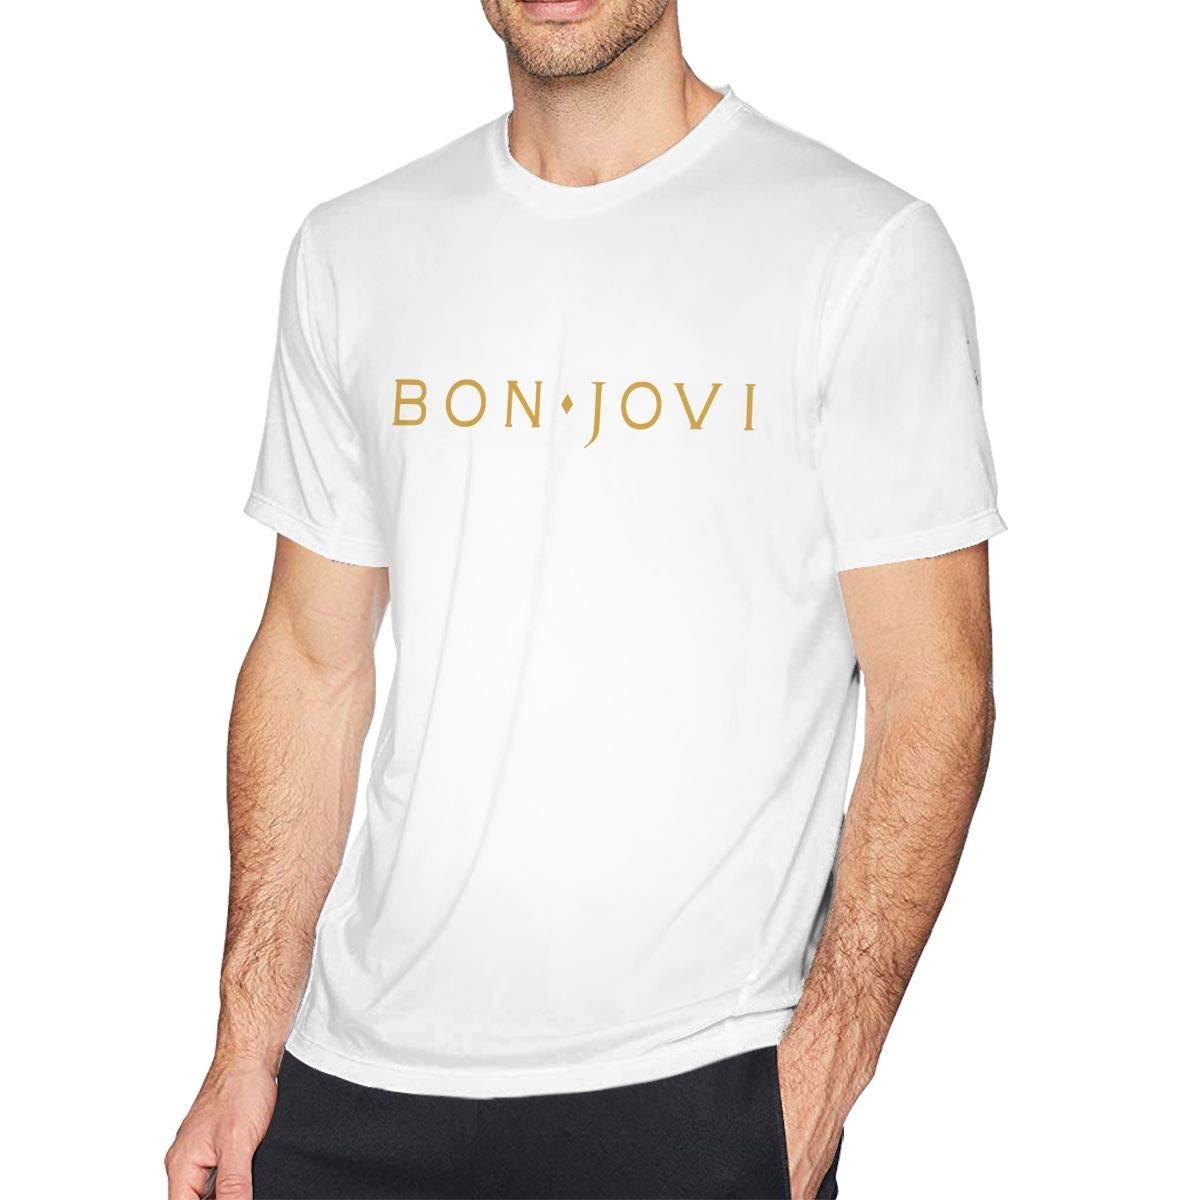 FengYuqi Bon Jovi Man Classic Short Sleeve T-Shirt Athletic Cool Running T-Shirt Black